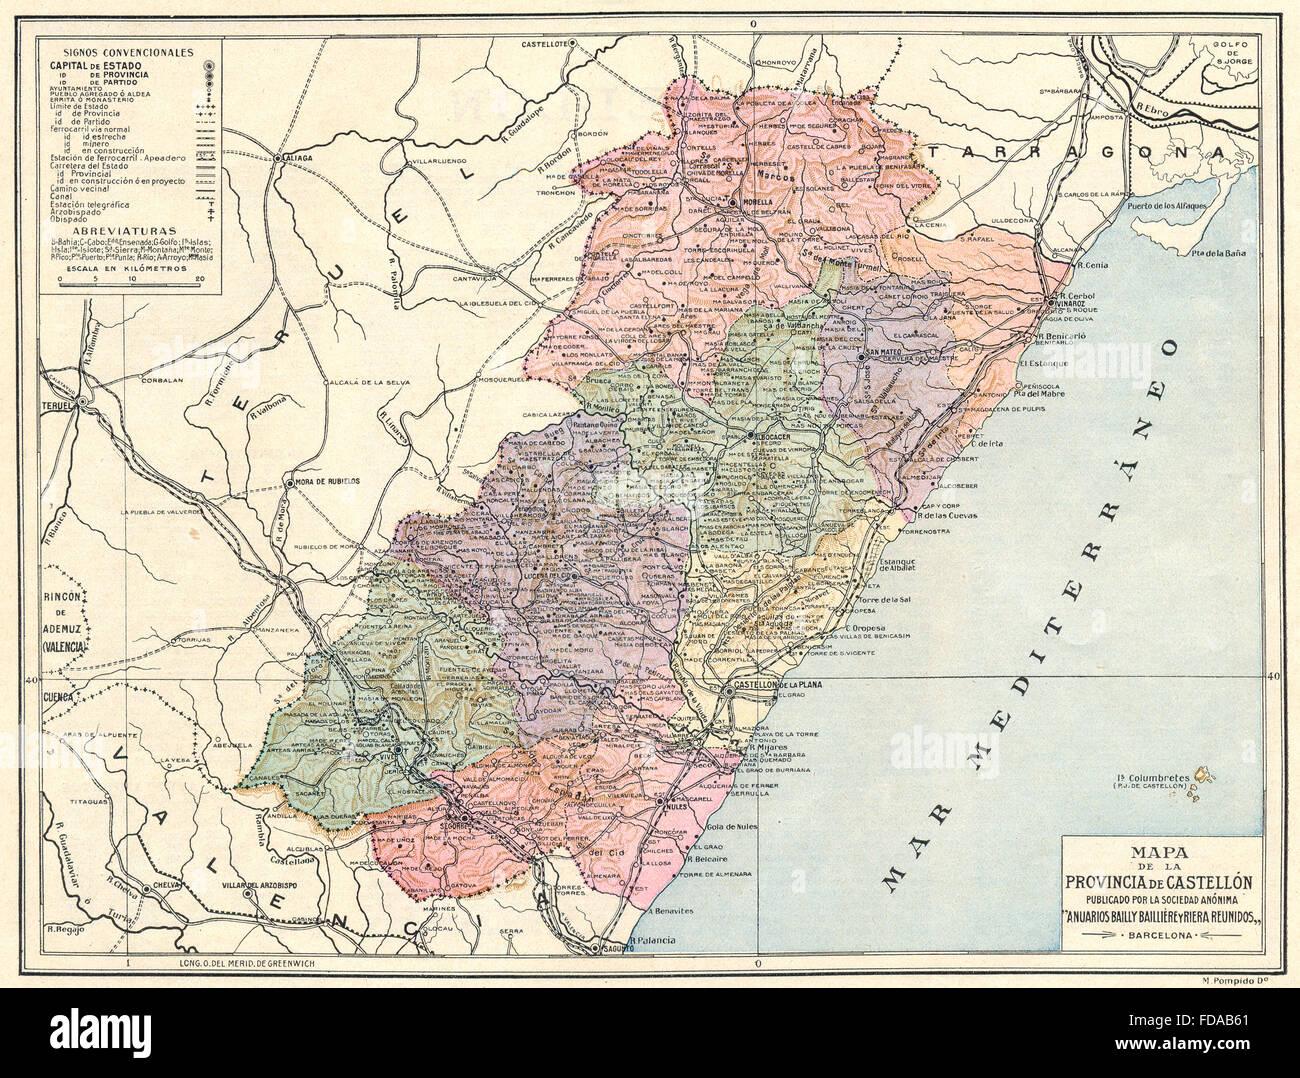 Provincia De Castellón Mapa.Spain Mapa De La Provincia De Castellon 1913 Stock Photo